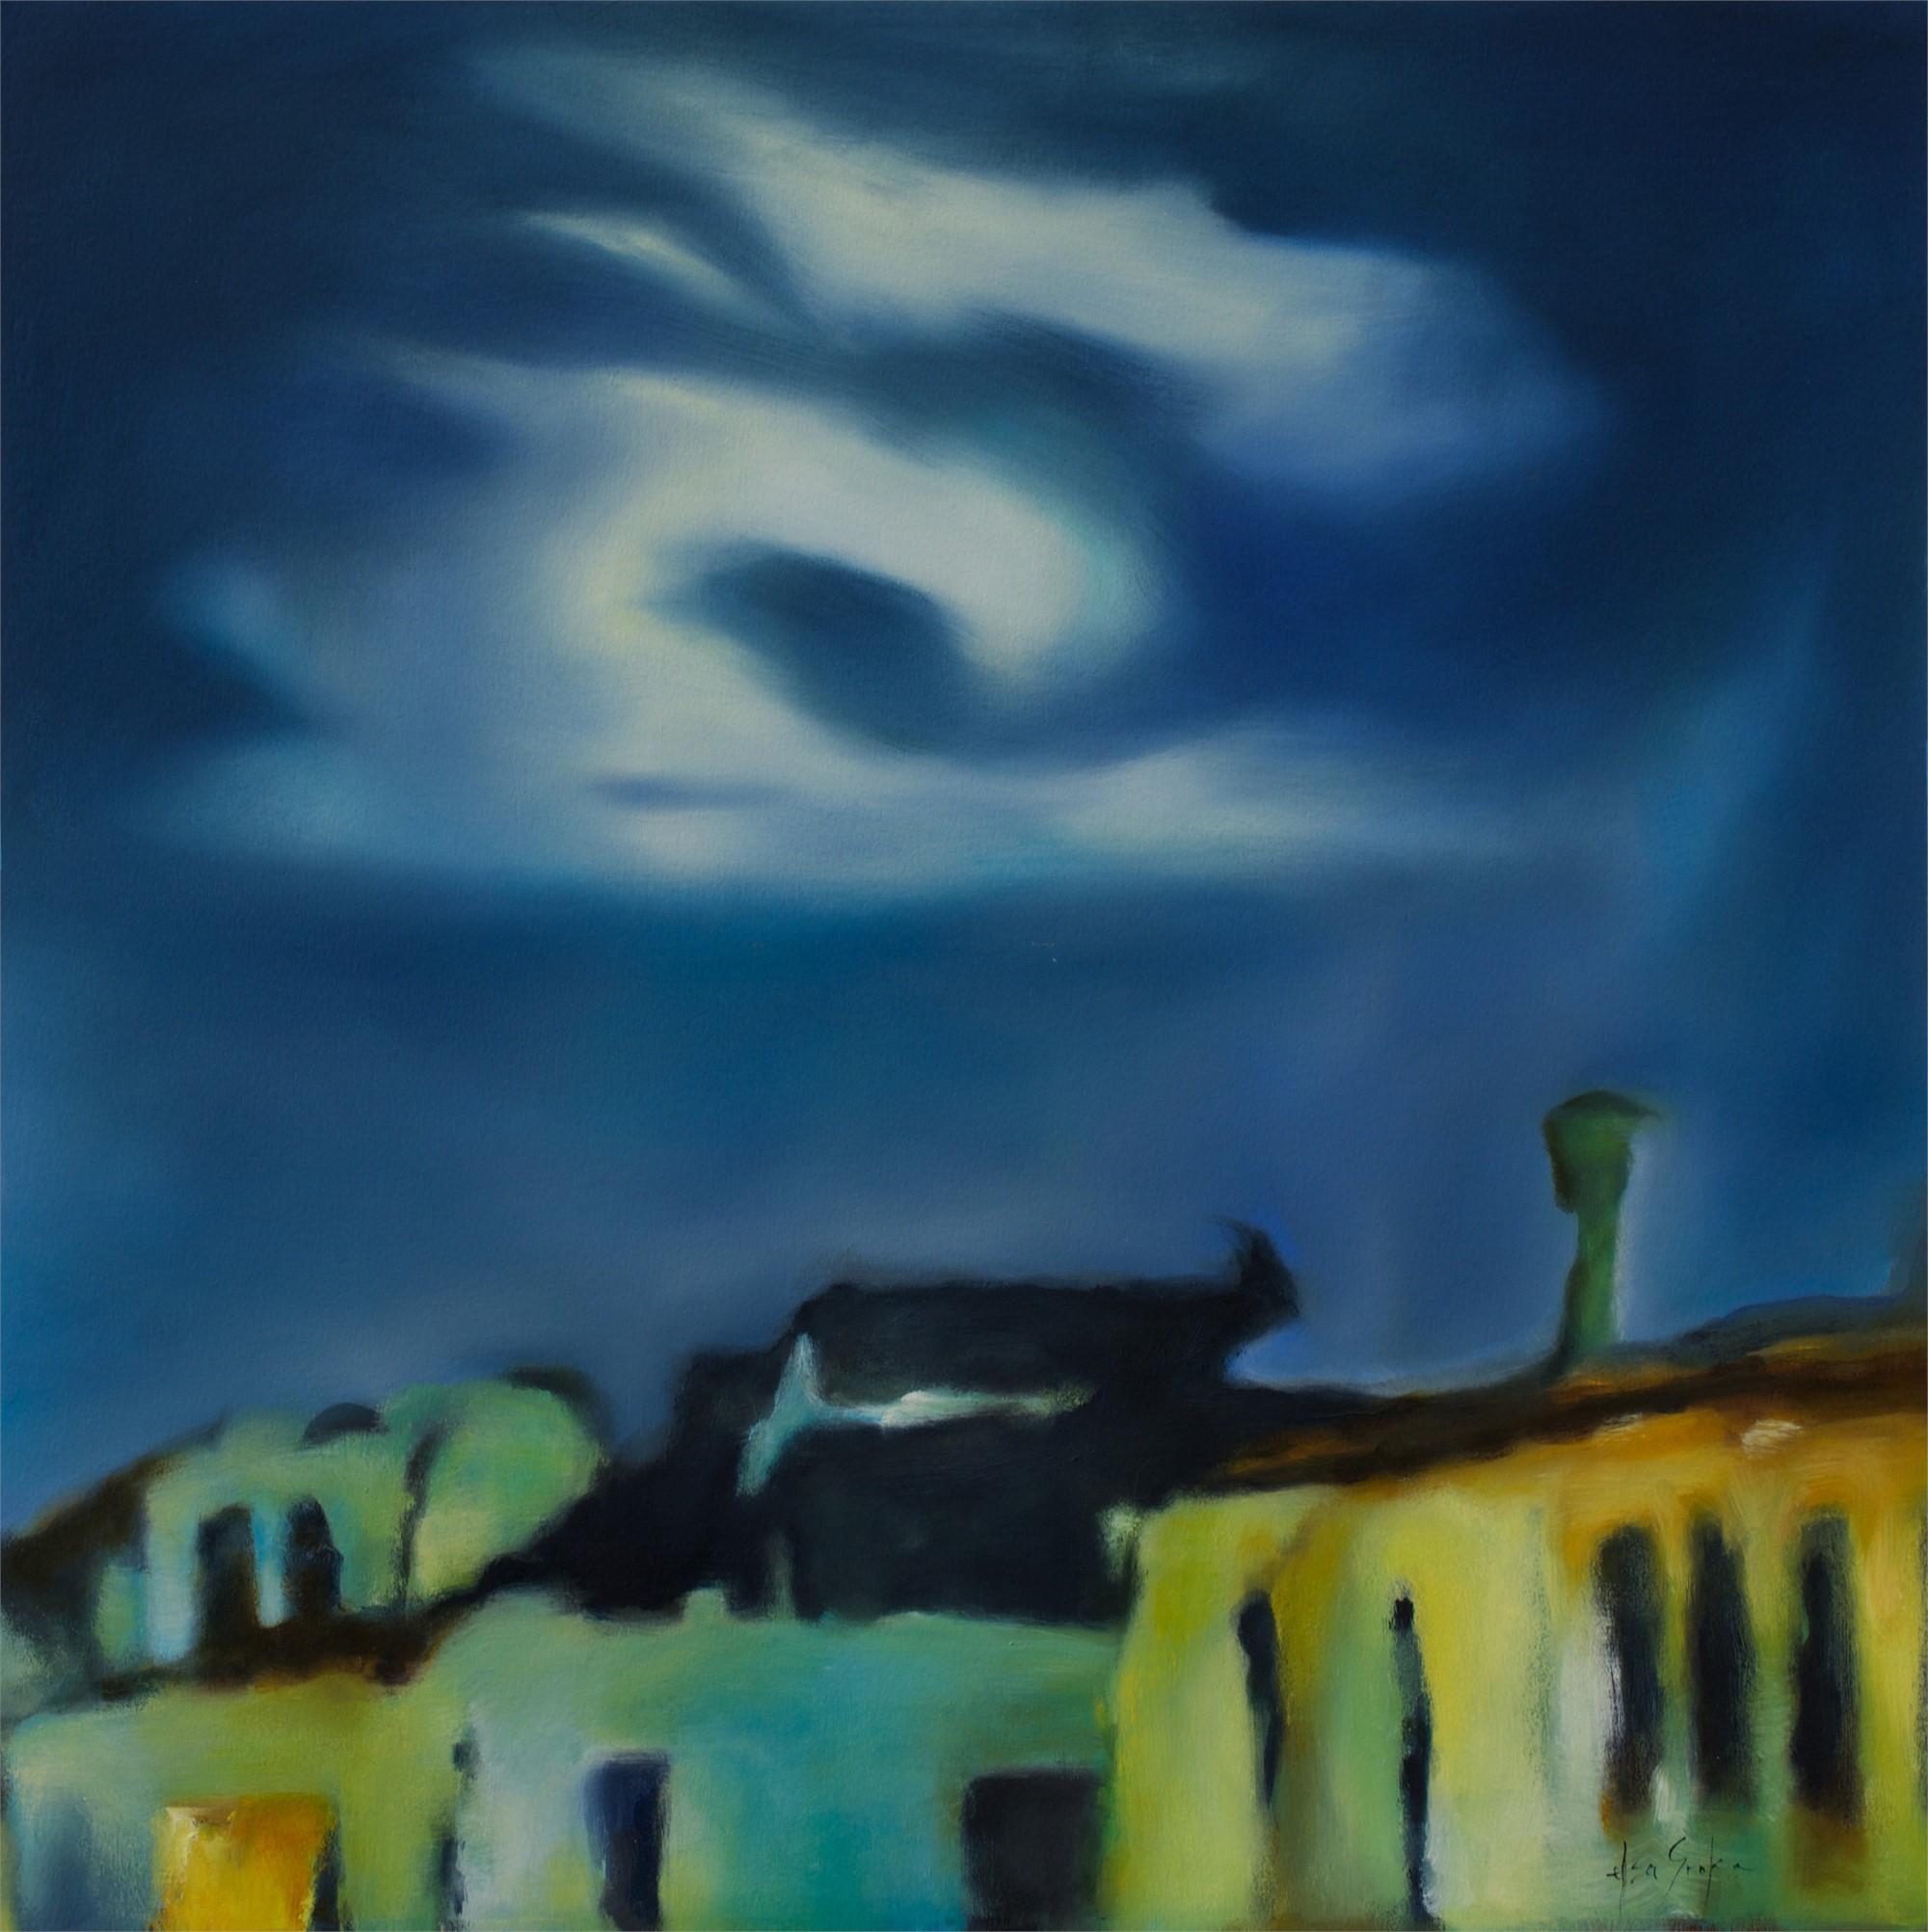 Before Midnight by Elsa Sroka